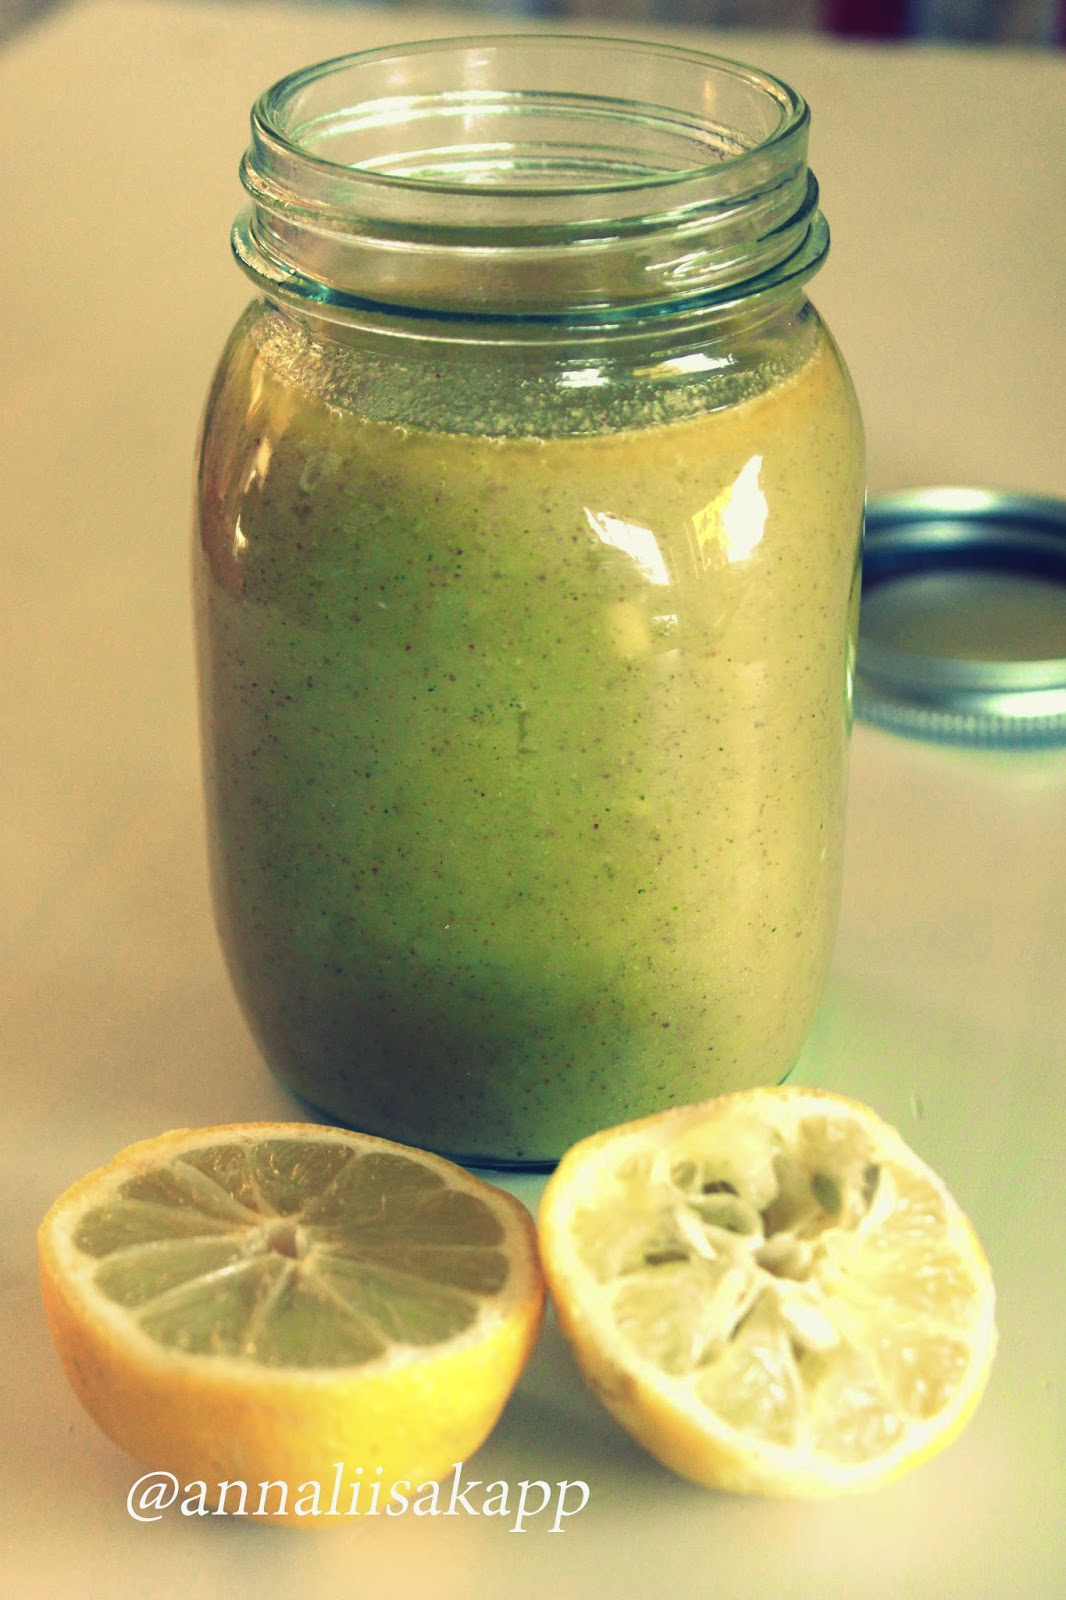 Big Batch Metabolism Boosting Salad Dressing with Lemon, Maple and Mustard